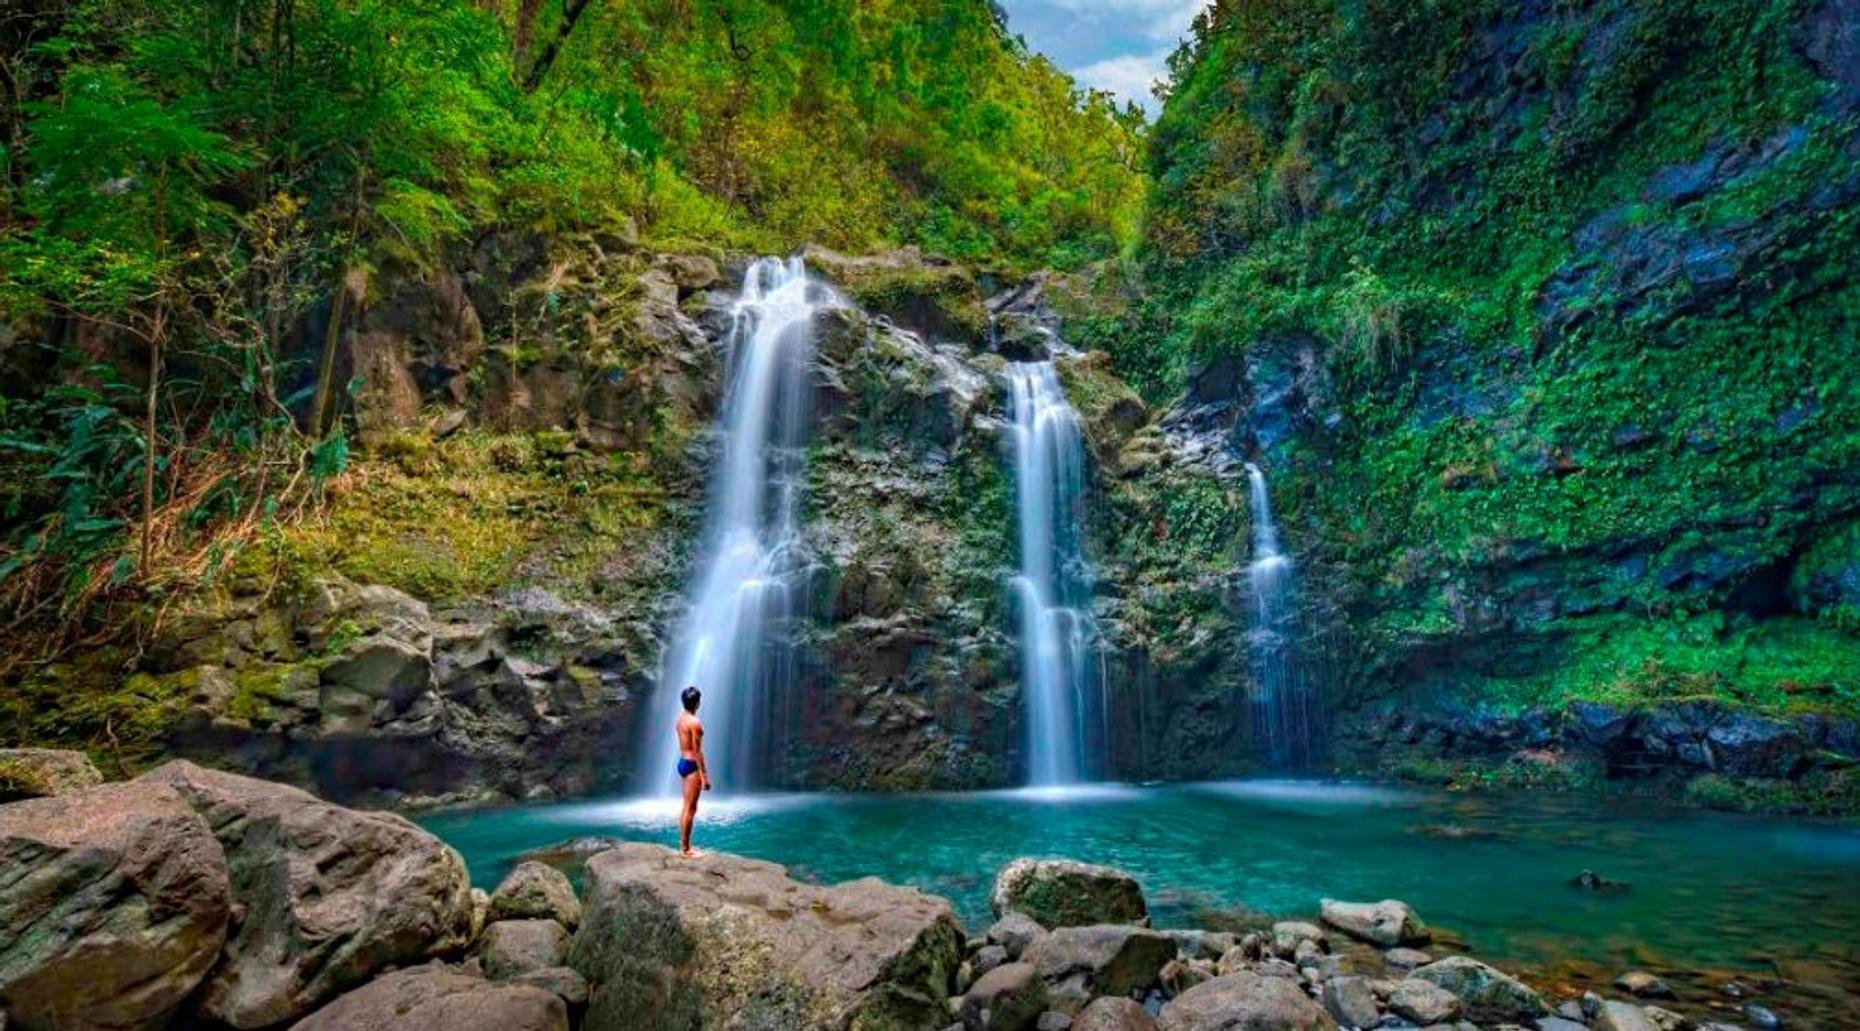 Luxury Road to Hana Waterfalls & Lunch